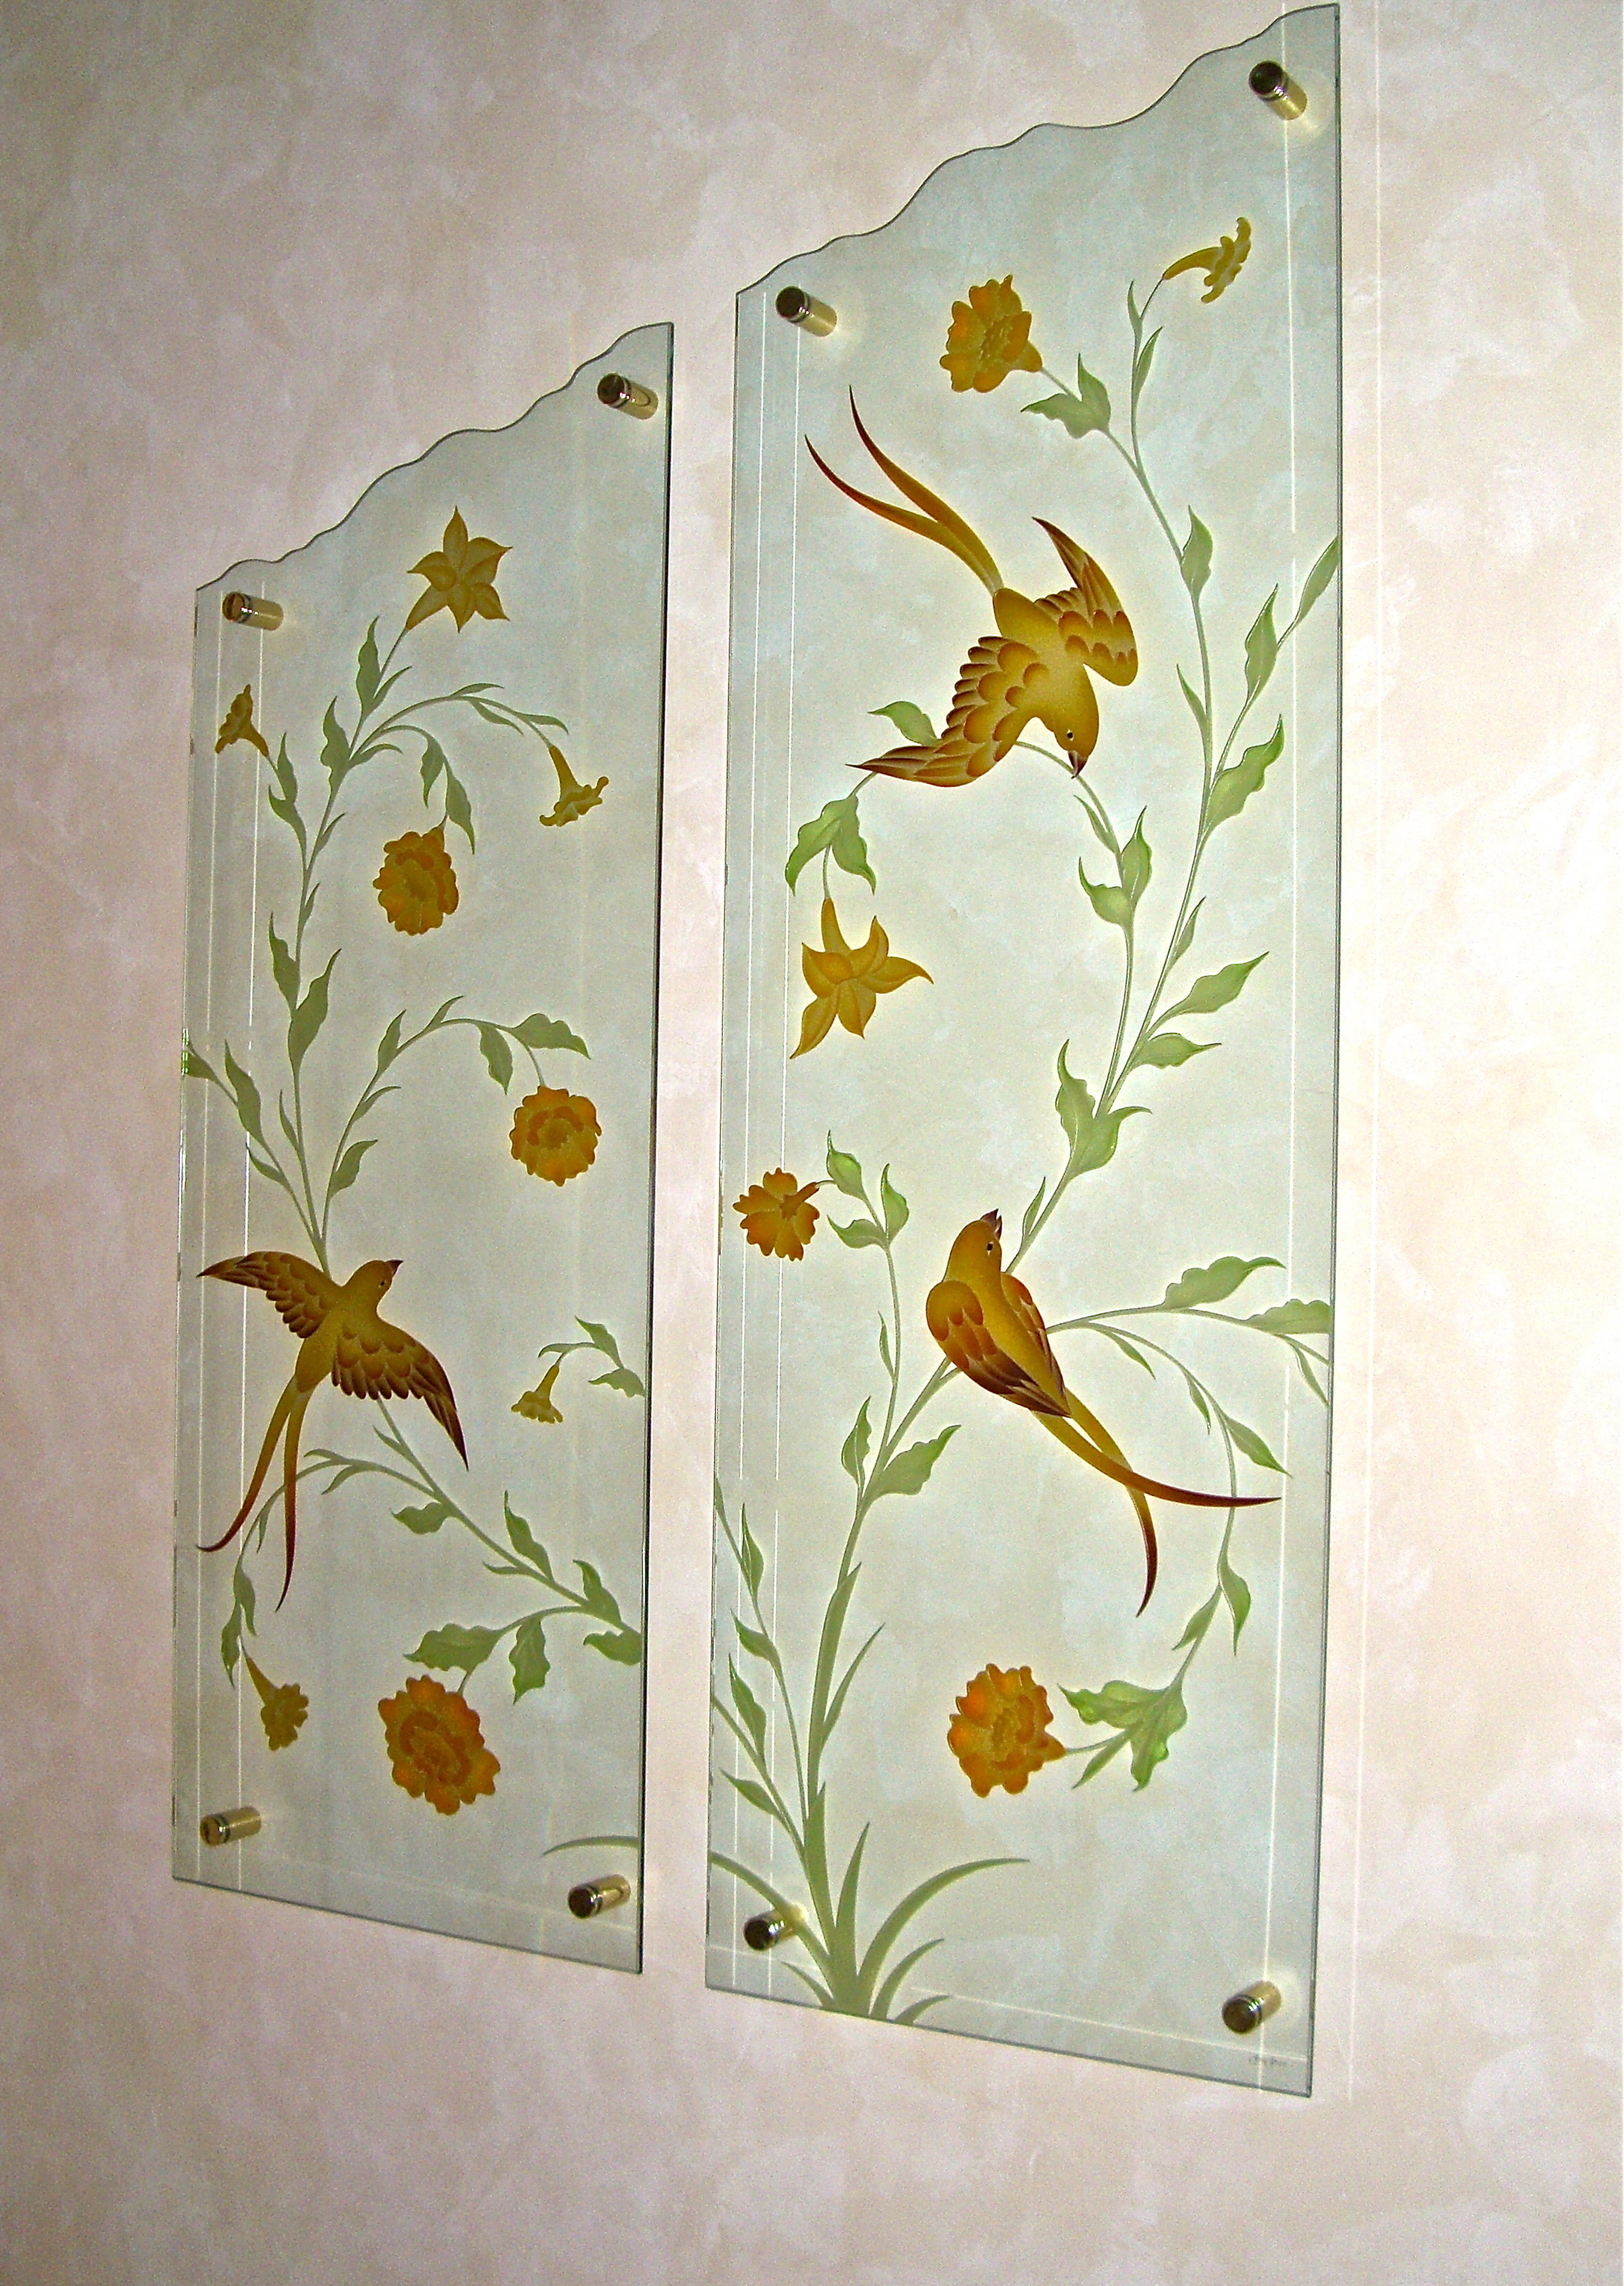 Golden Dovetails